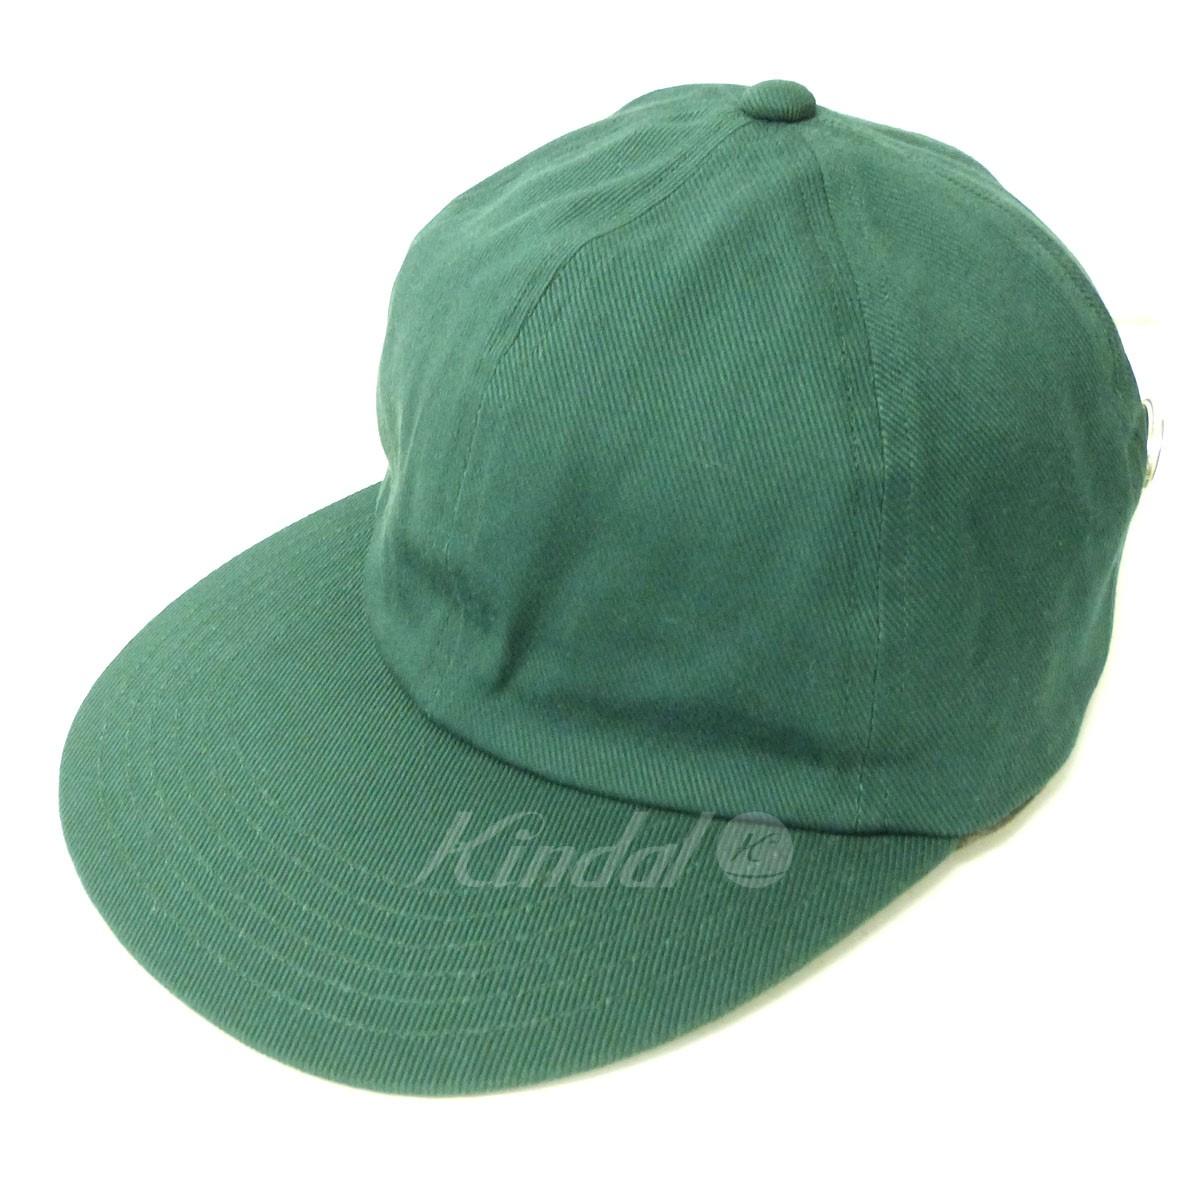 cap Black Jaws 3D Embroidery premium type fishing hat